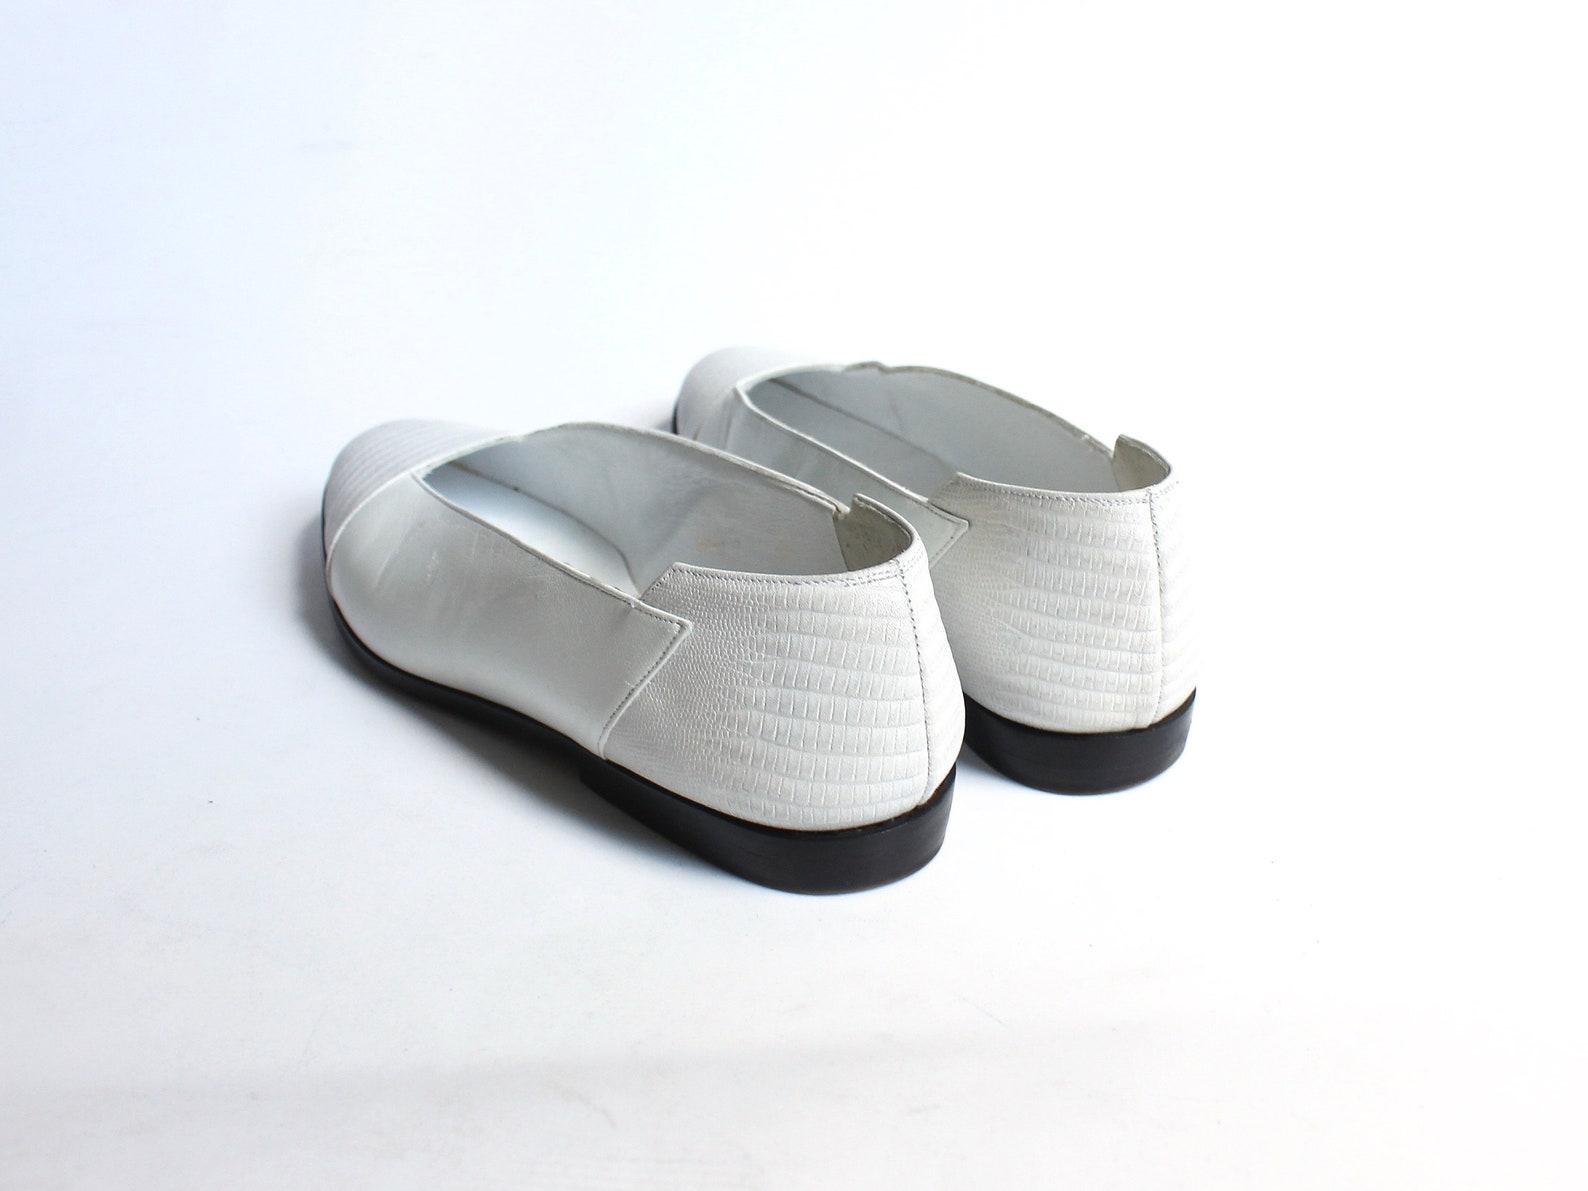 vintage lanvin ballet flats // 1980s designer shoes // embossed white leather slip on flats // womens size 6.5